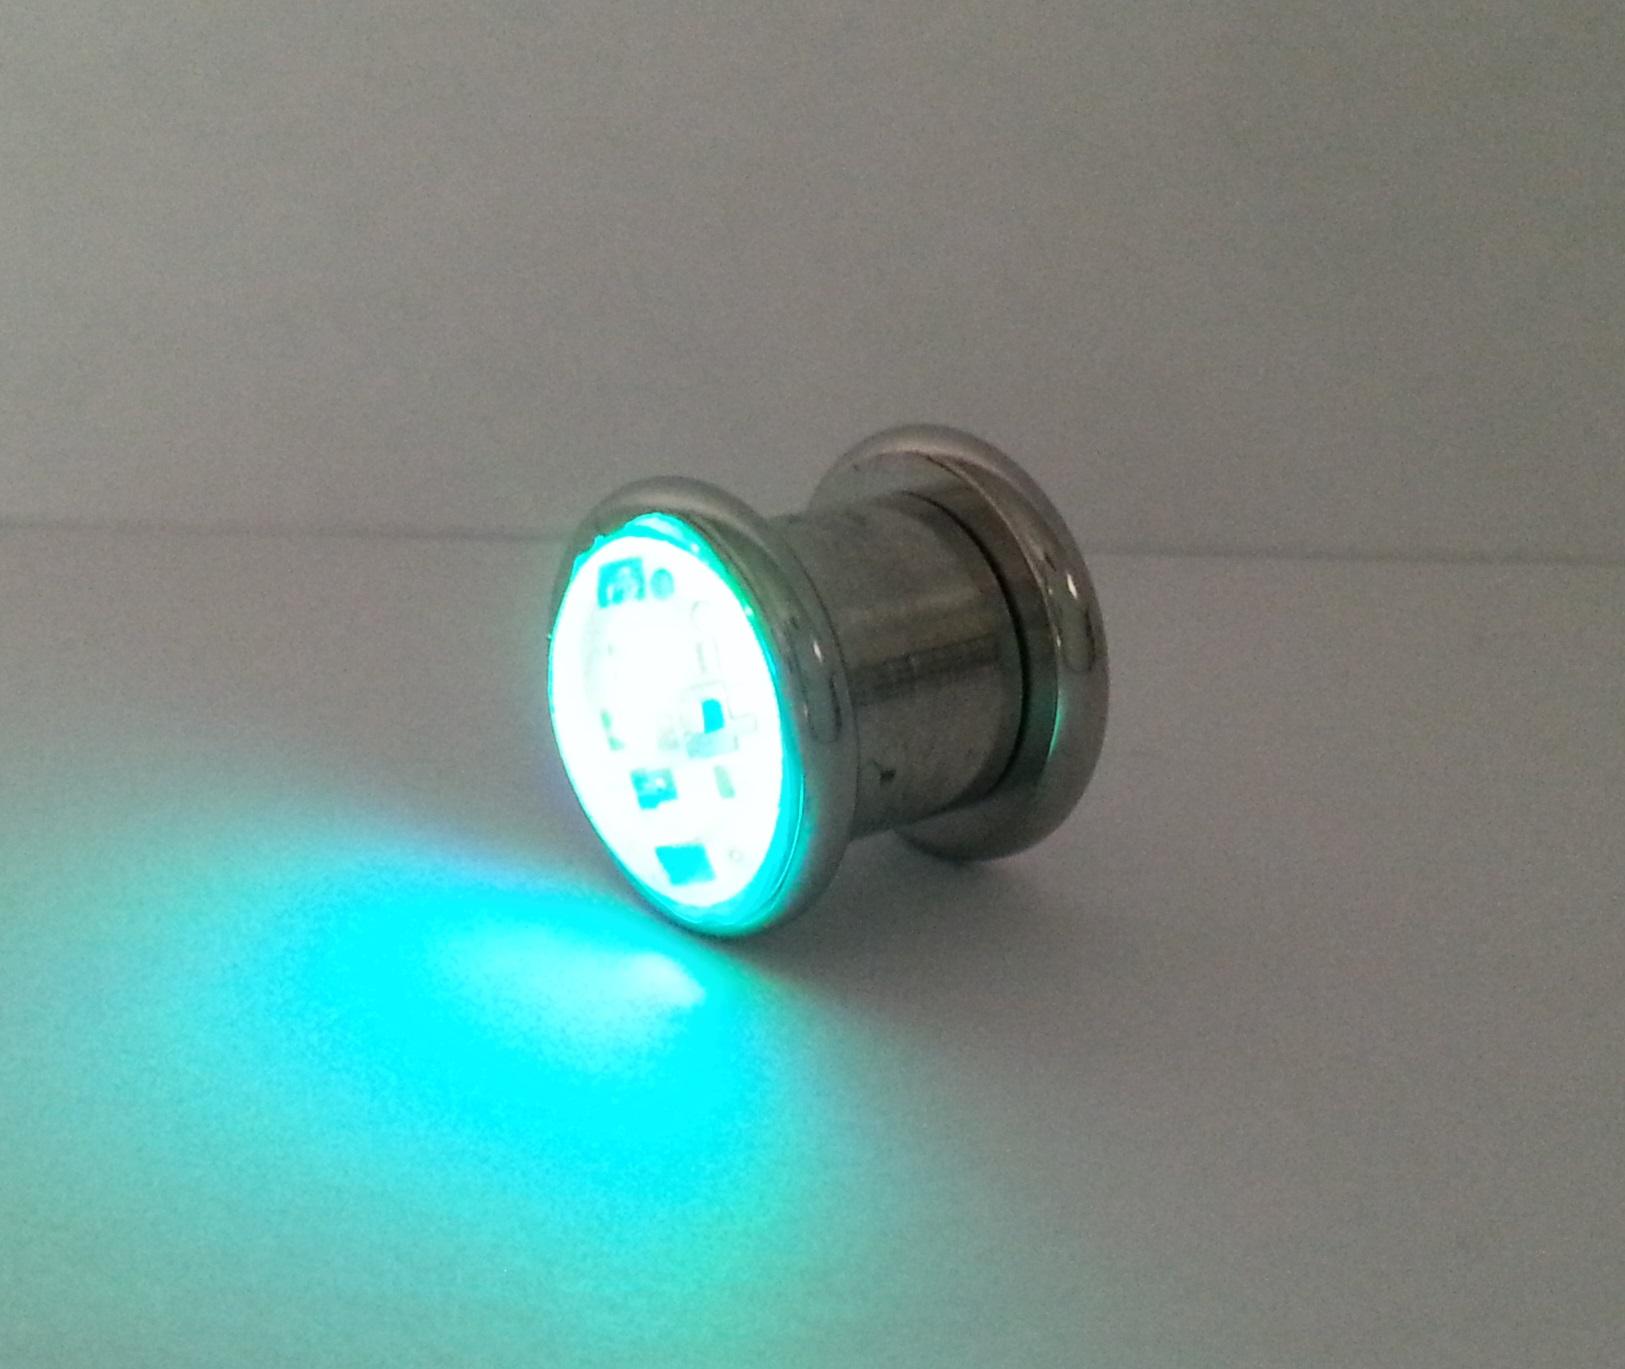 Change Led Light Bulbs